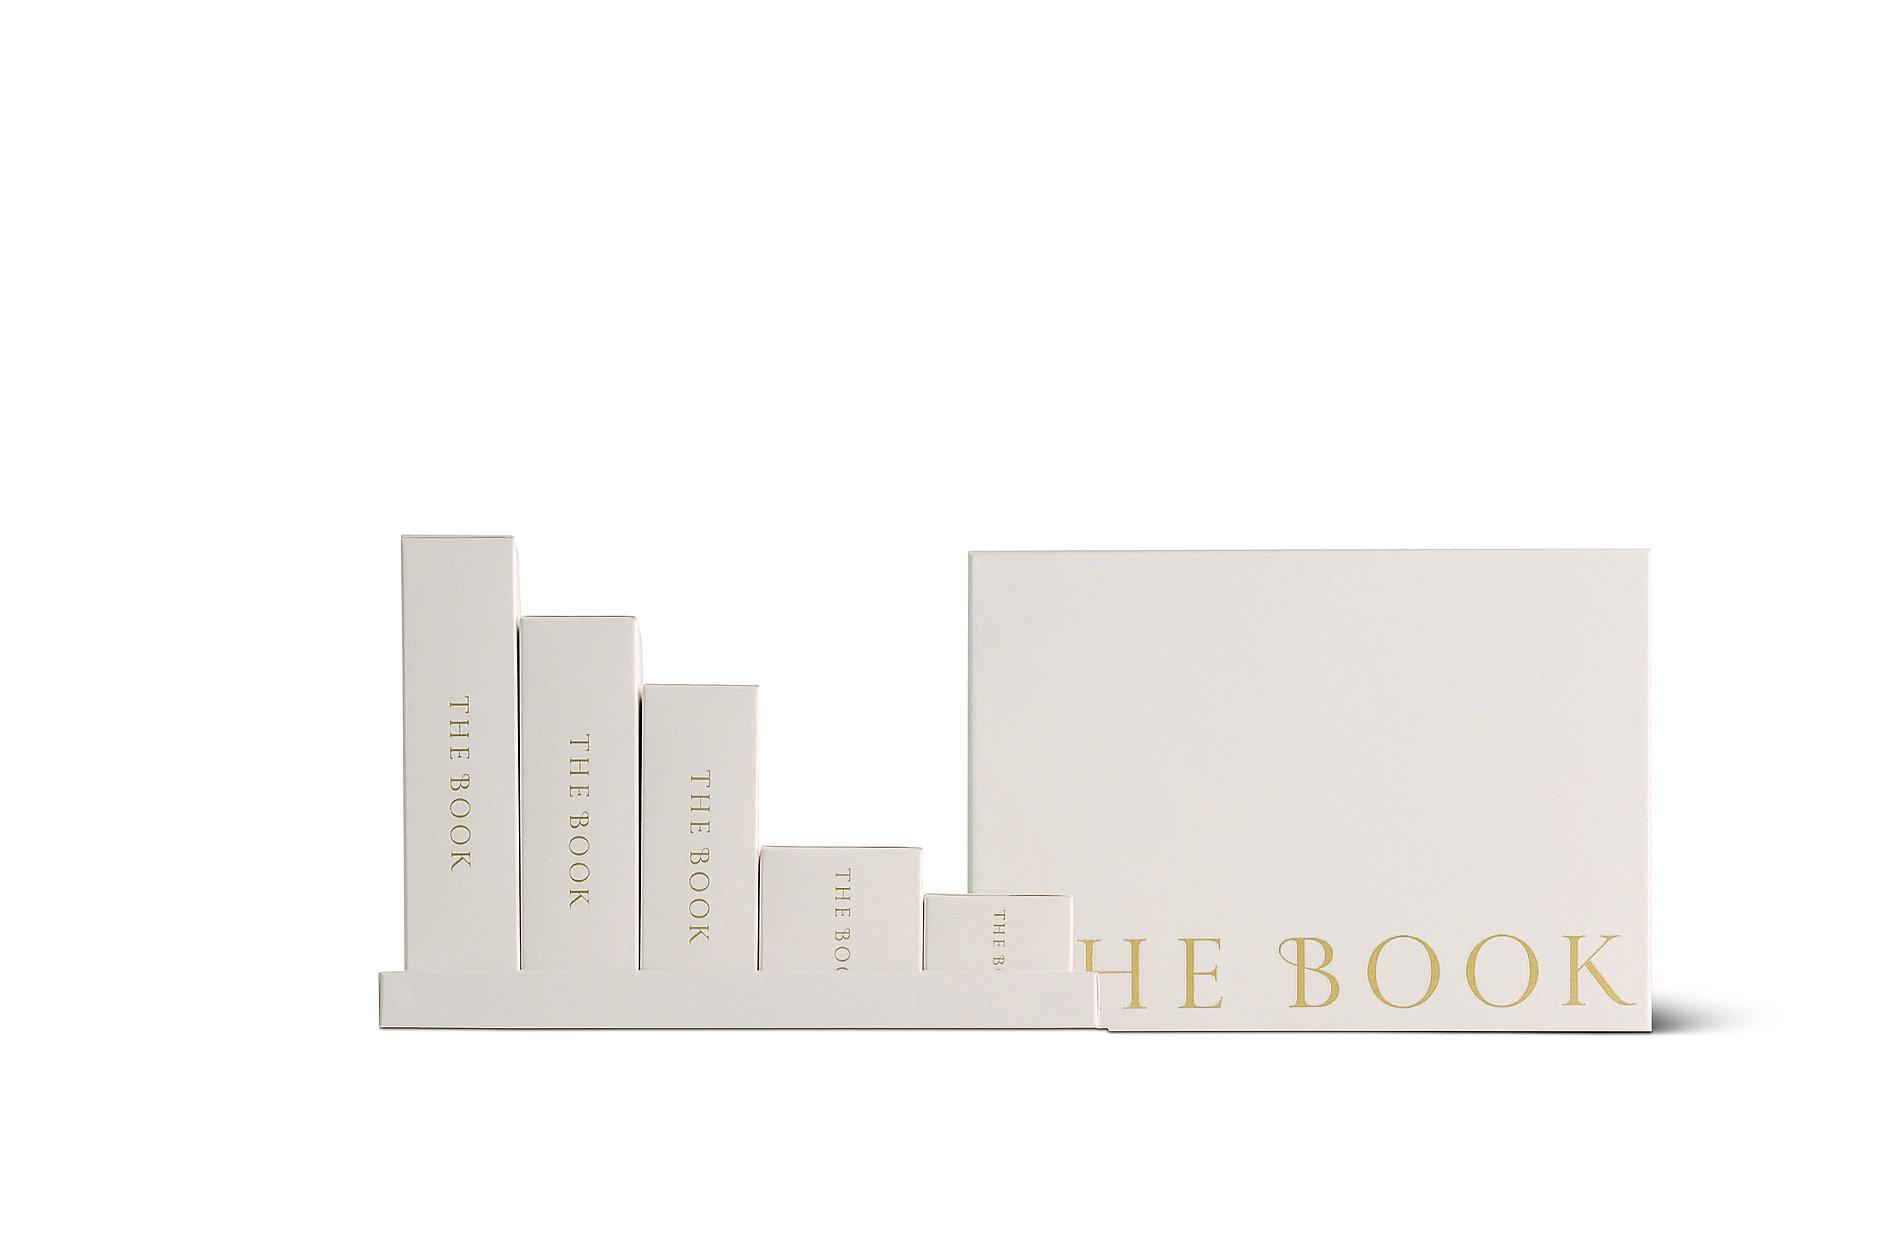 THE BOOK | Red Dot Design Award